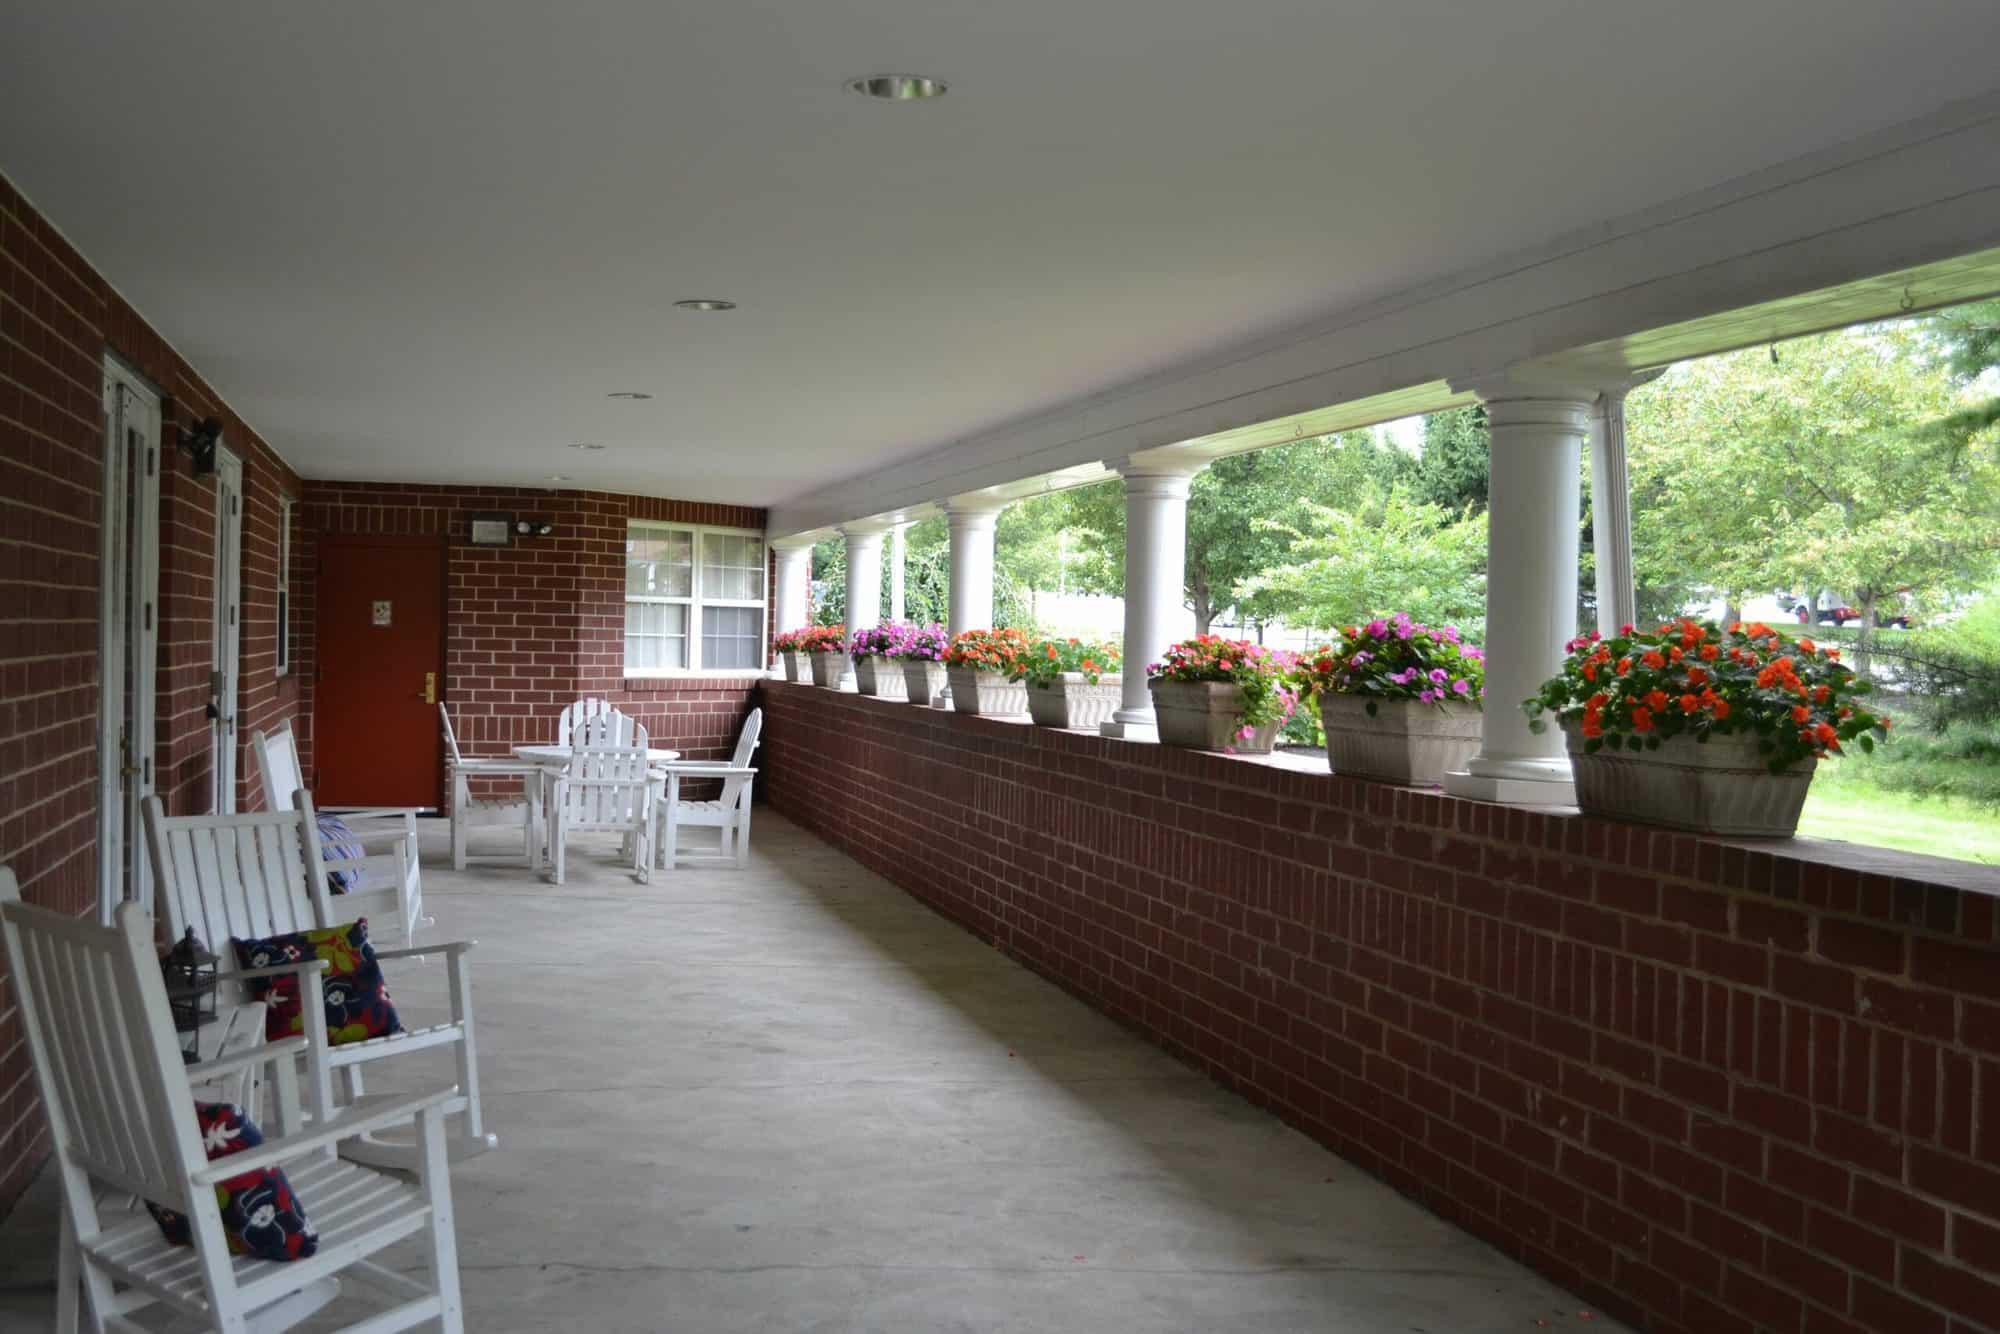 exton senior living porch